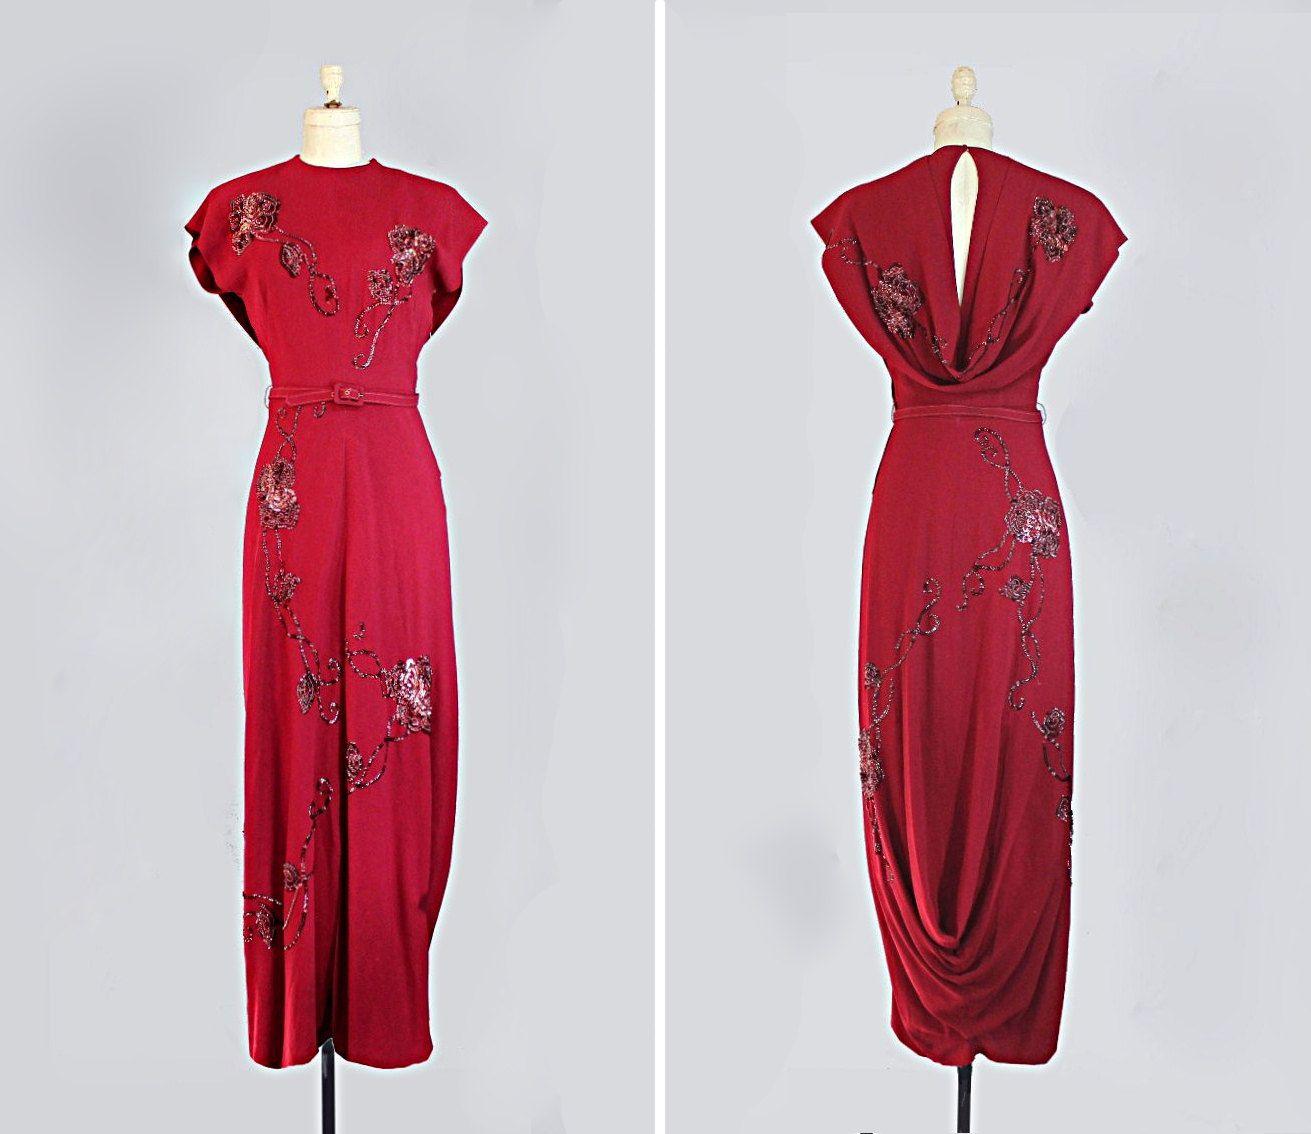 Vintage 1940s Dress 40s Evening Gown Sequined Draped Size Extra Small Small 1940s Evening Dresses 1940s Dresses Dresses 40s [ 1134 x 1311 Pixel ]